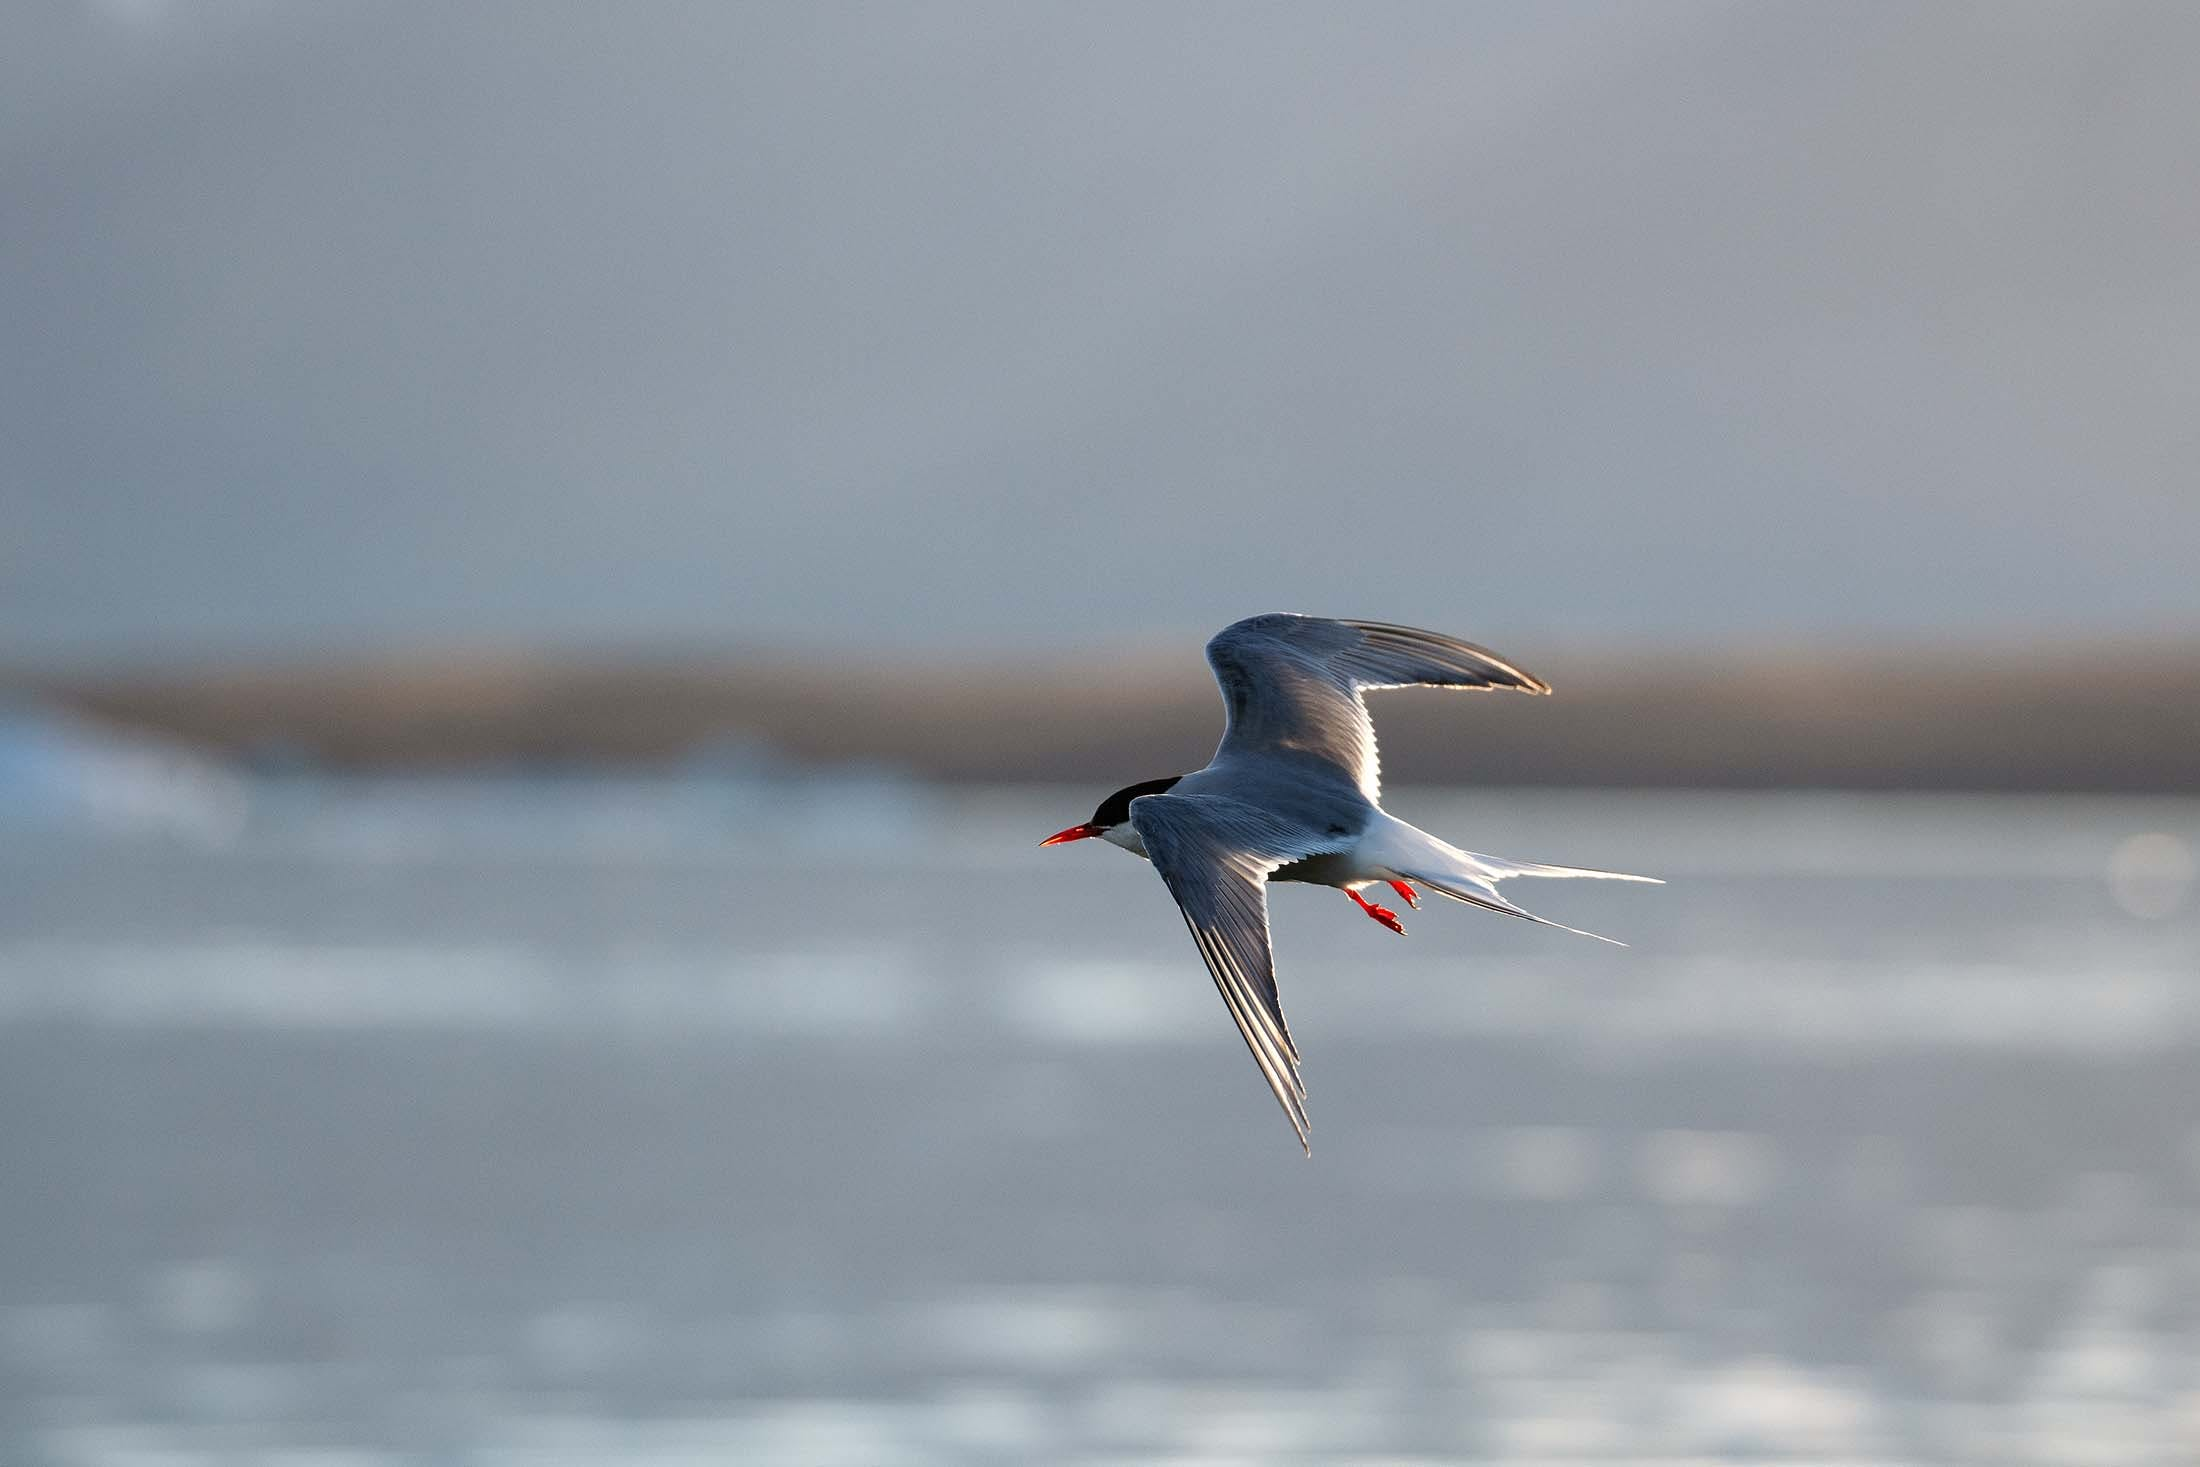 Arctic Tern in flight, Glacier Lagoon, Iceland